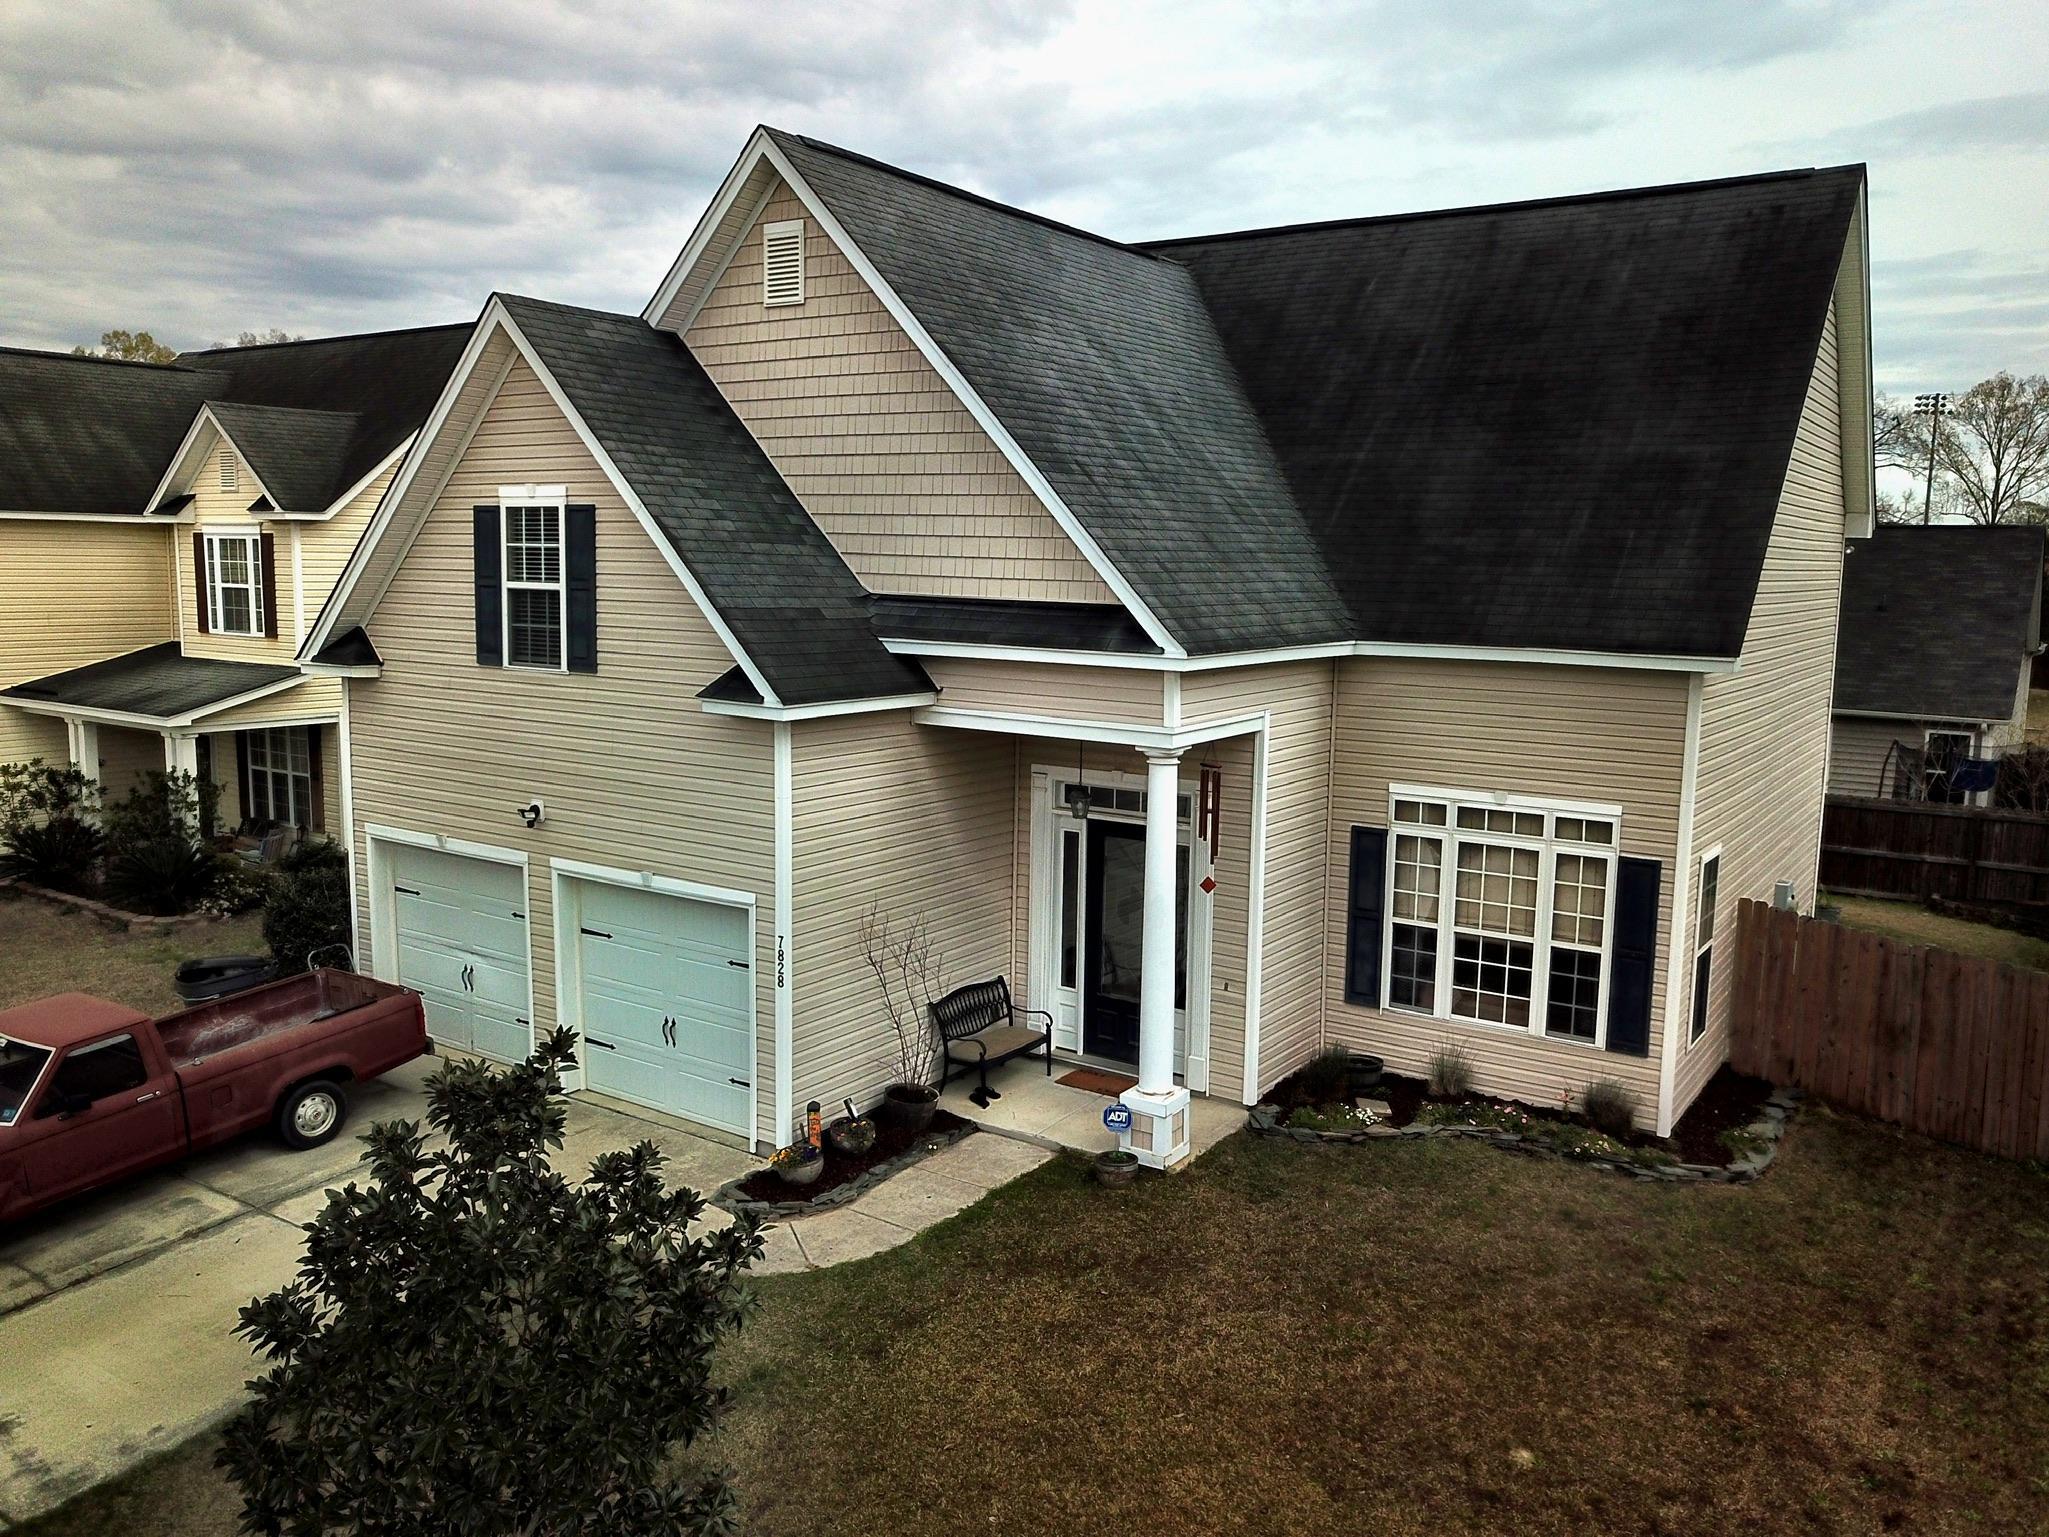 Colony North II Homes For Sale - 7828 Magellan, North Charleston, SC - 9